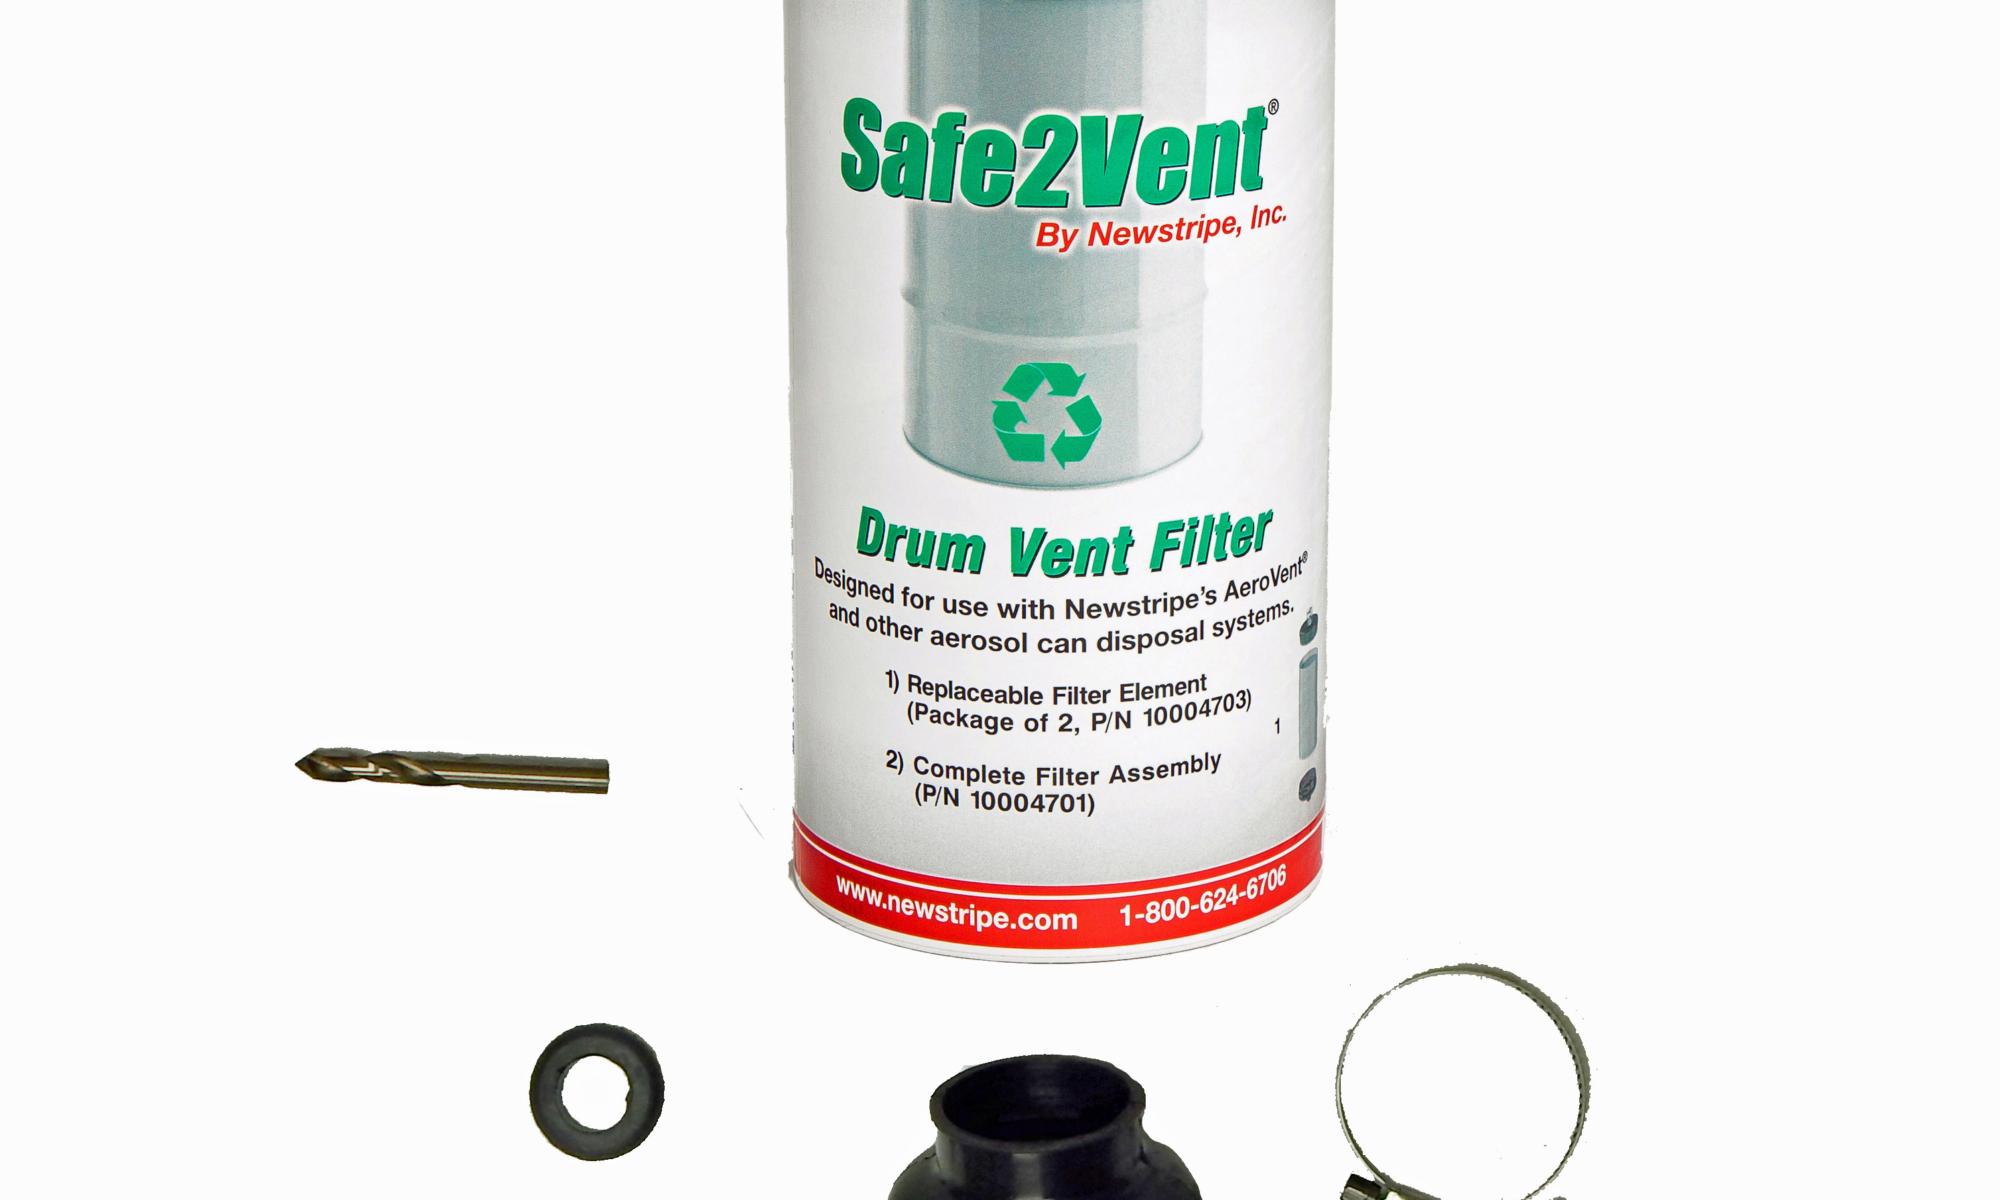 Kit includes the following aerosol disposal equipment: 1) 10004702, Safe2Vent Filter Replacement 2) 10001874, Trough Liner Grommet 1) 10003791, Bellow 2) 10003794, Bellow Clamps 1) 10003377, Cobalt Point